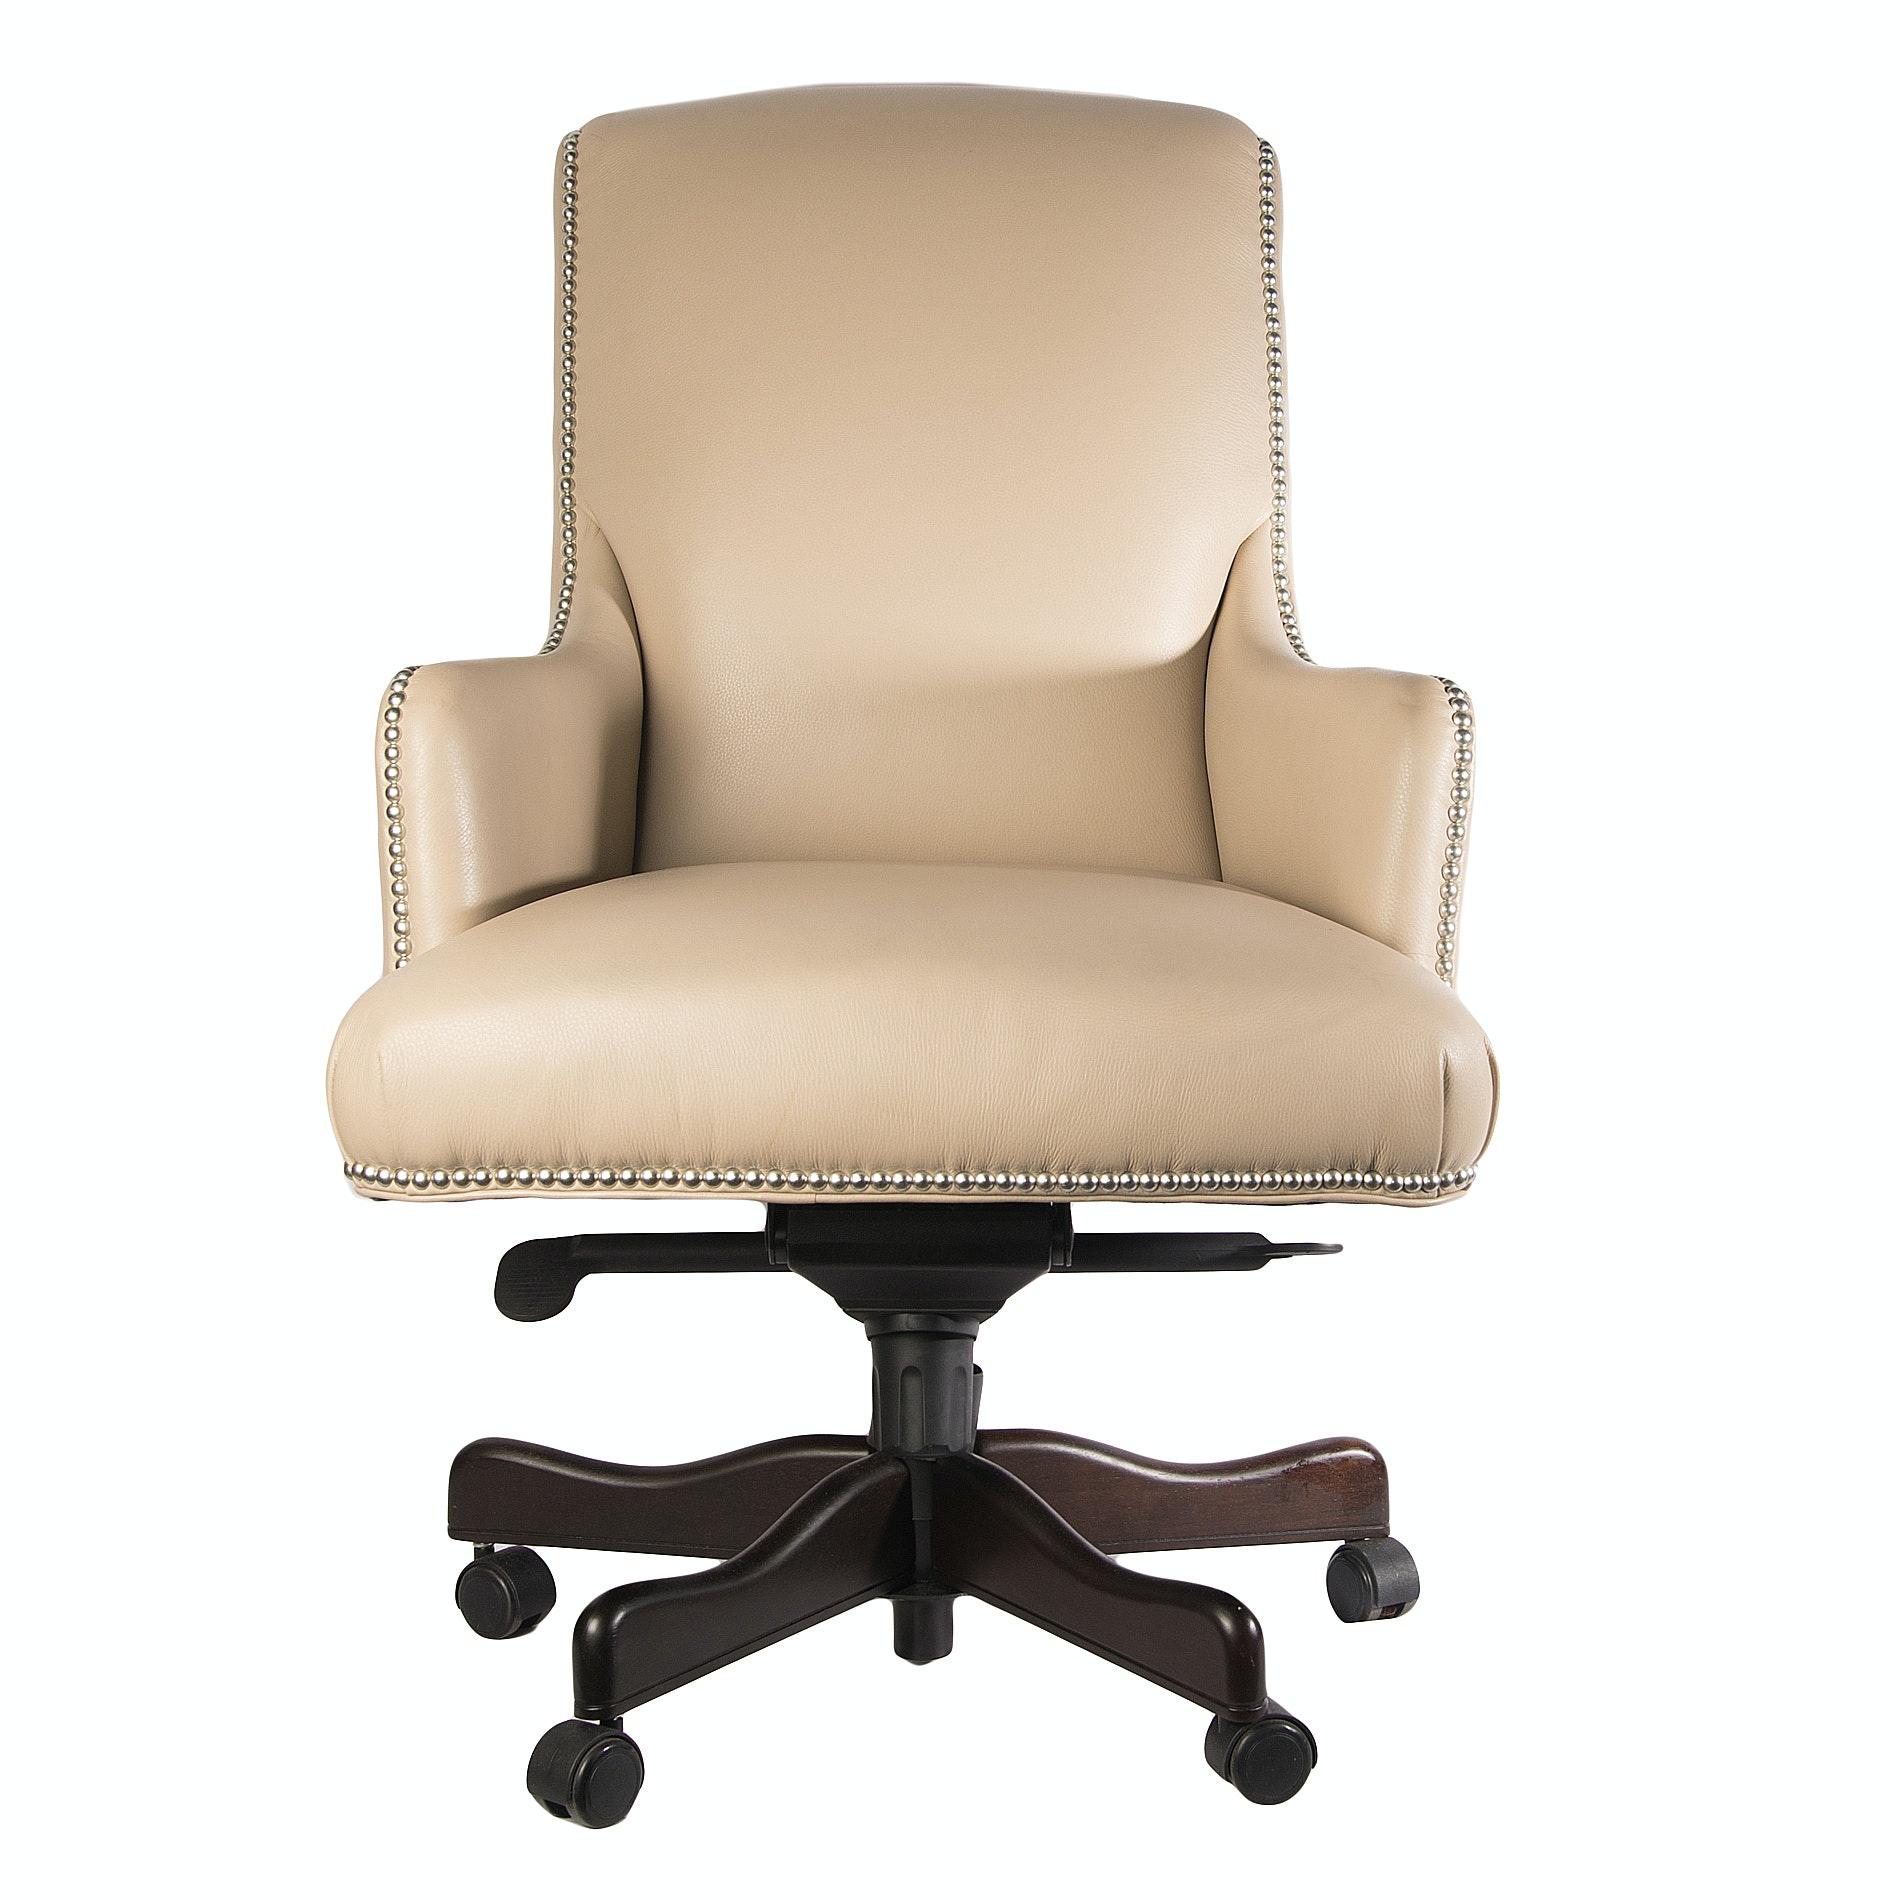 Havertys Ashlyn Office Chair